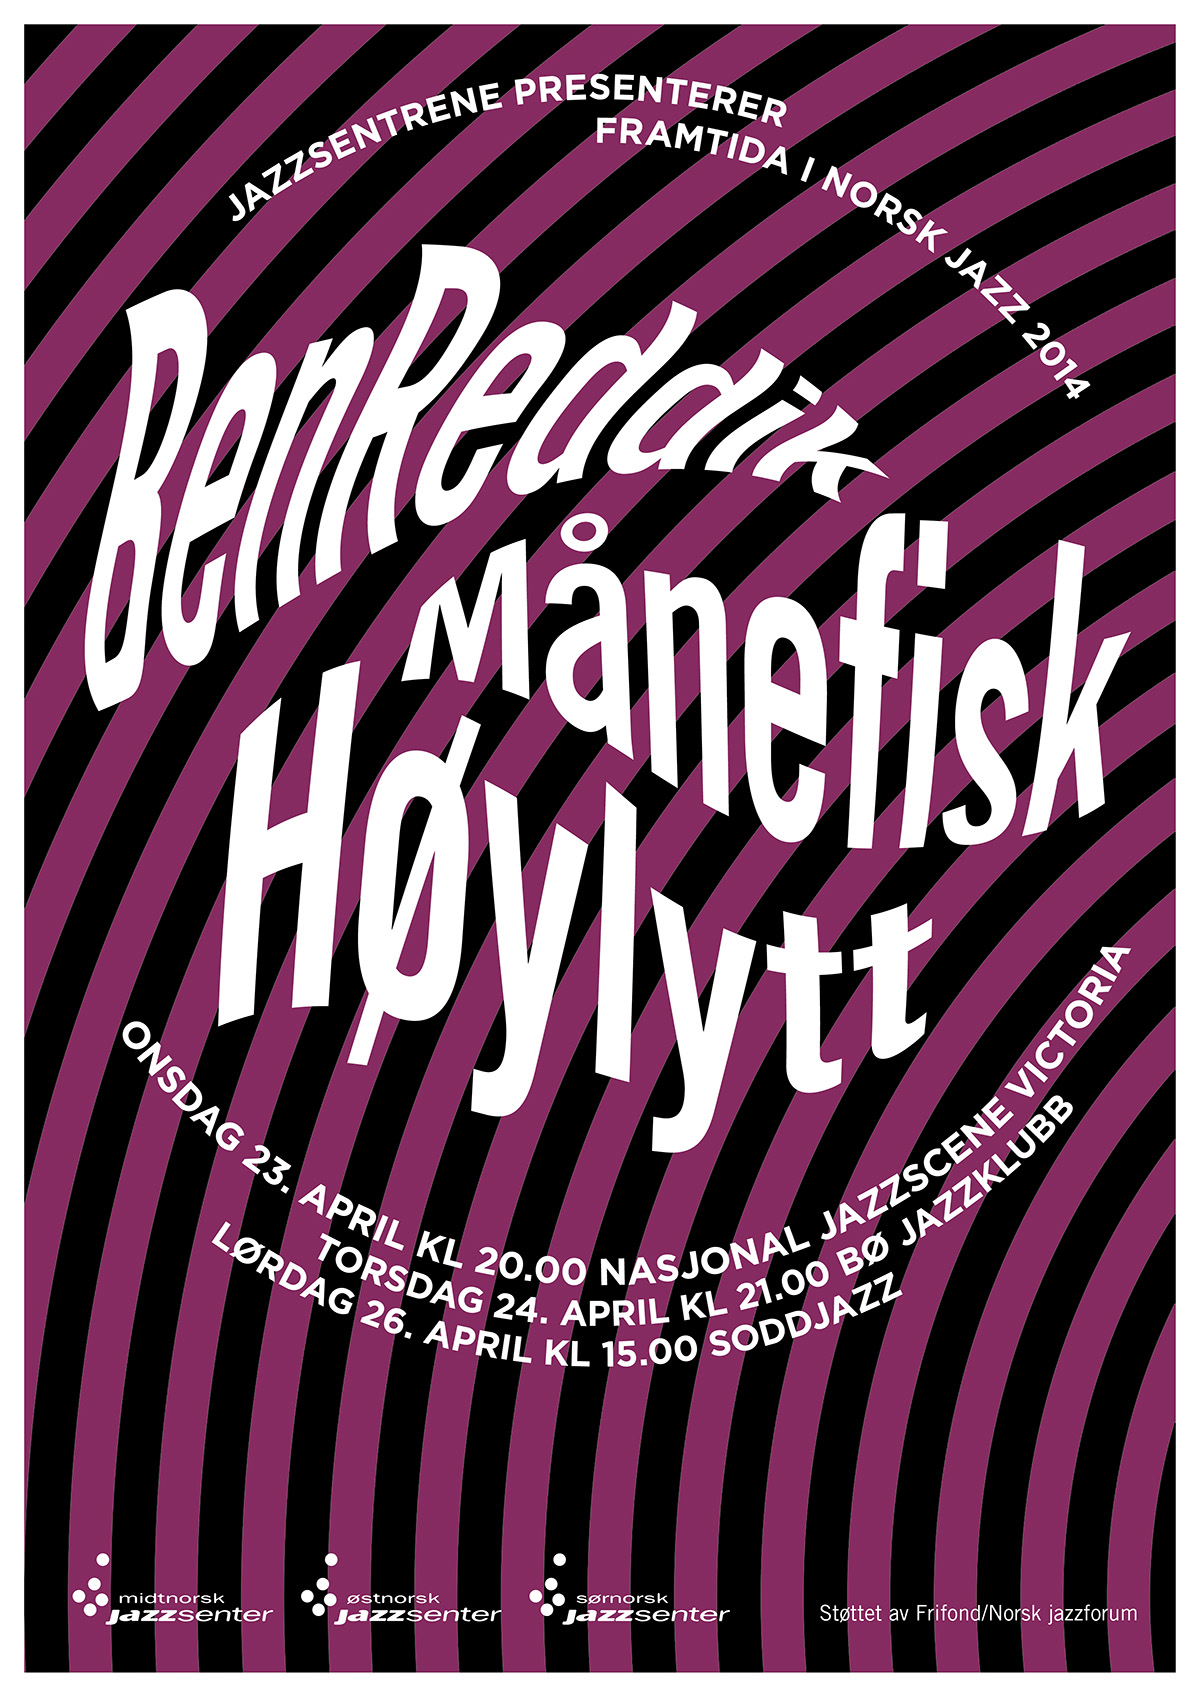 Framtida i norsk jazz 2014_plakat_A3